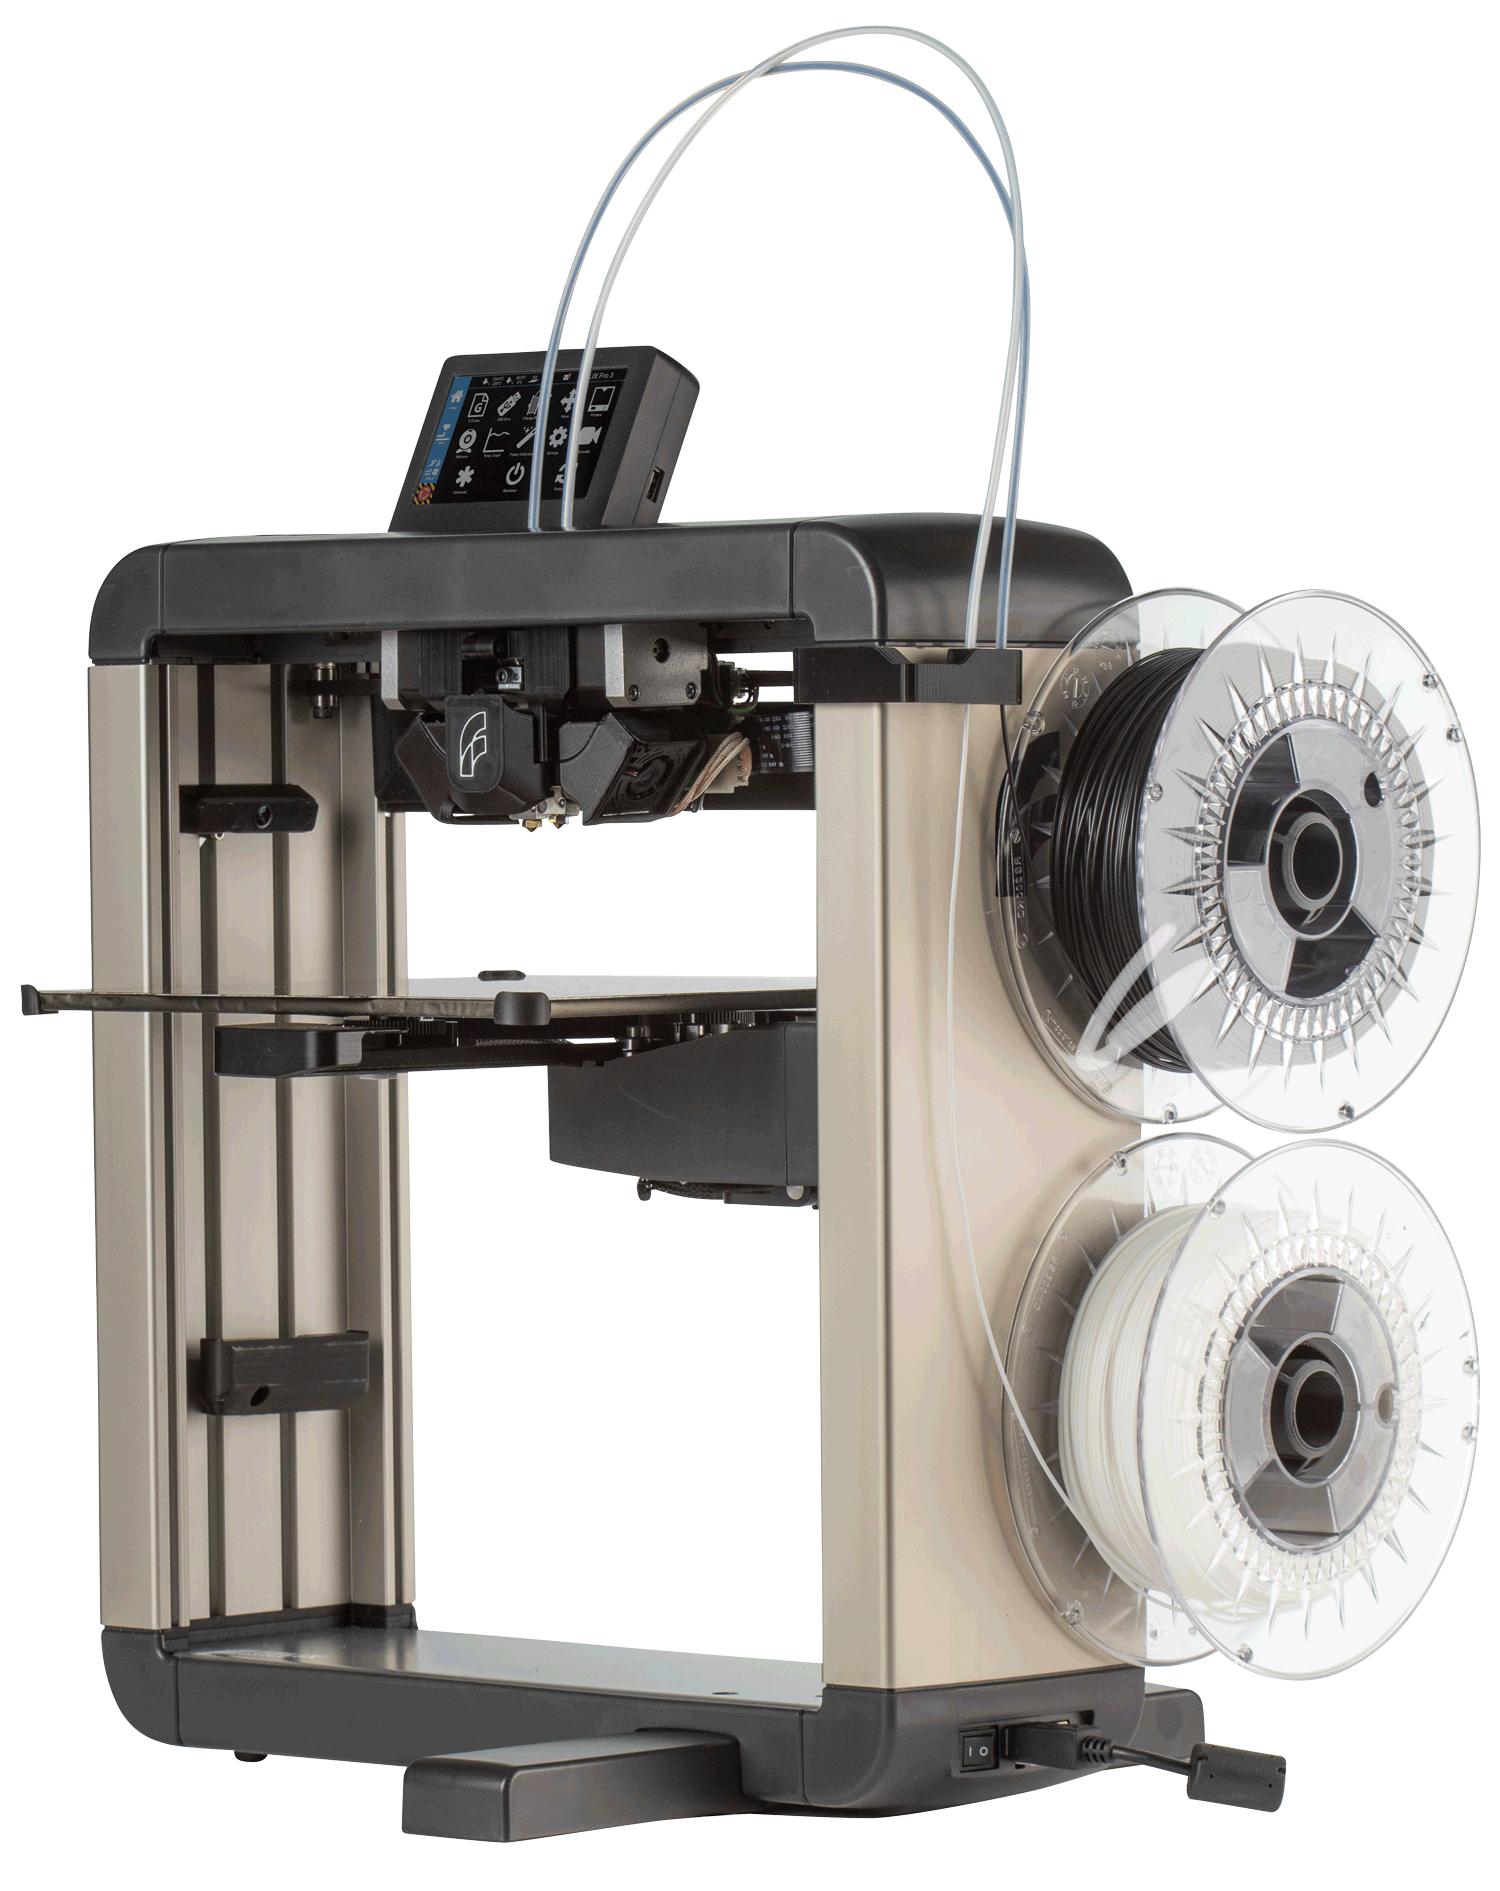 FELIX Pro 3 Touch - AMTech 3D Printing Egypt